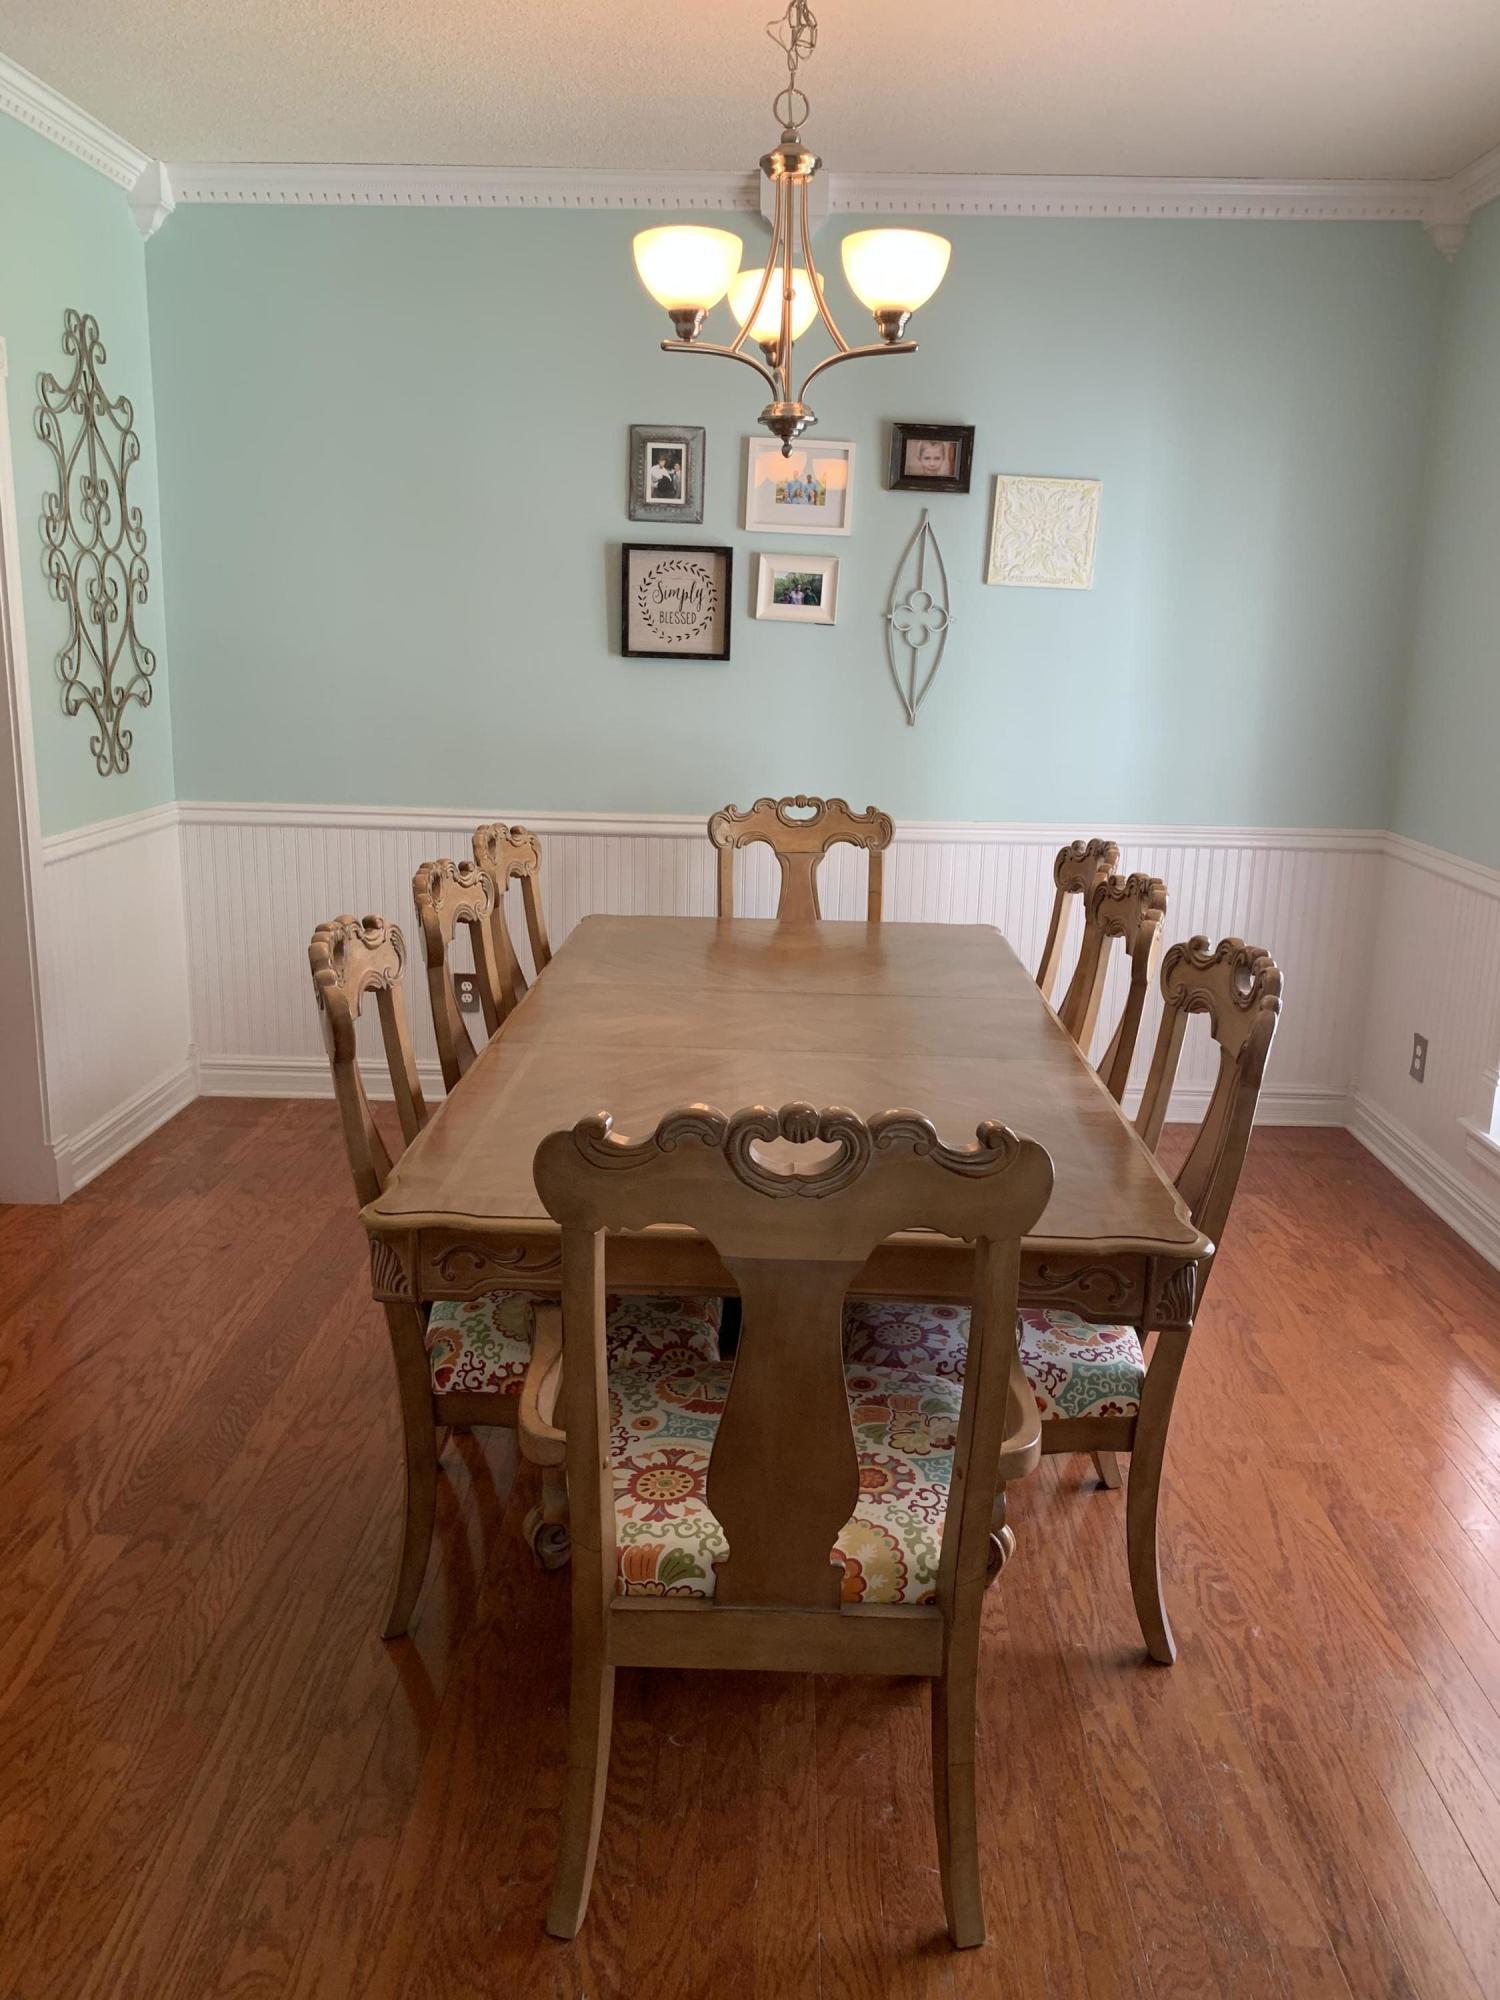 Whitehall Homes For Sale - 8598 Kennestone, North Charleston, SC - 0